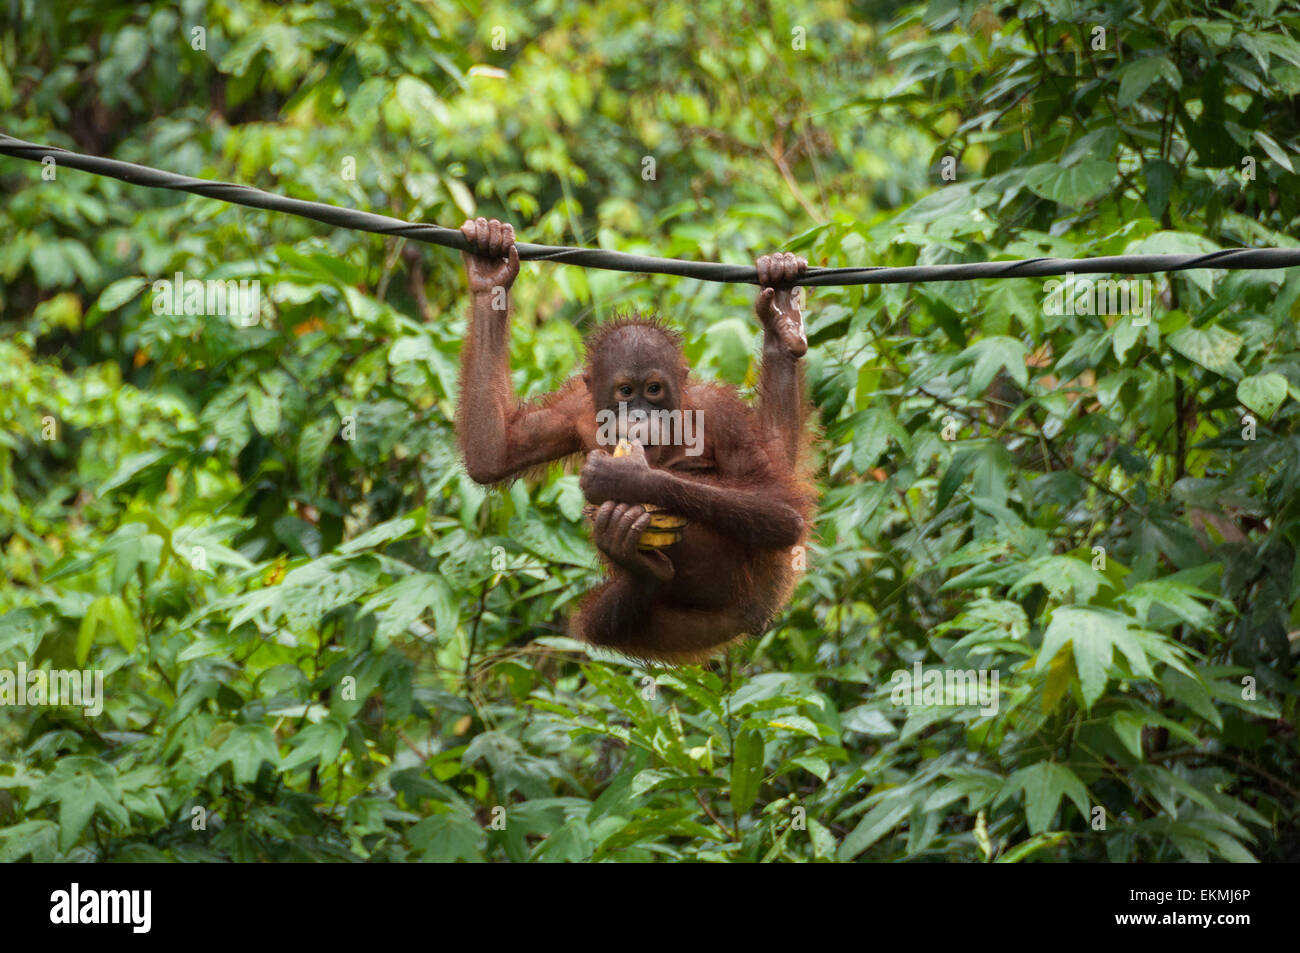 sepilok-orangutan-sanctuary-sabah-borneo-malaysia-EKMJ6P.jpg